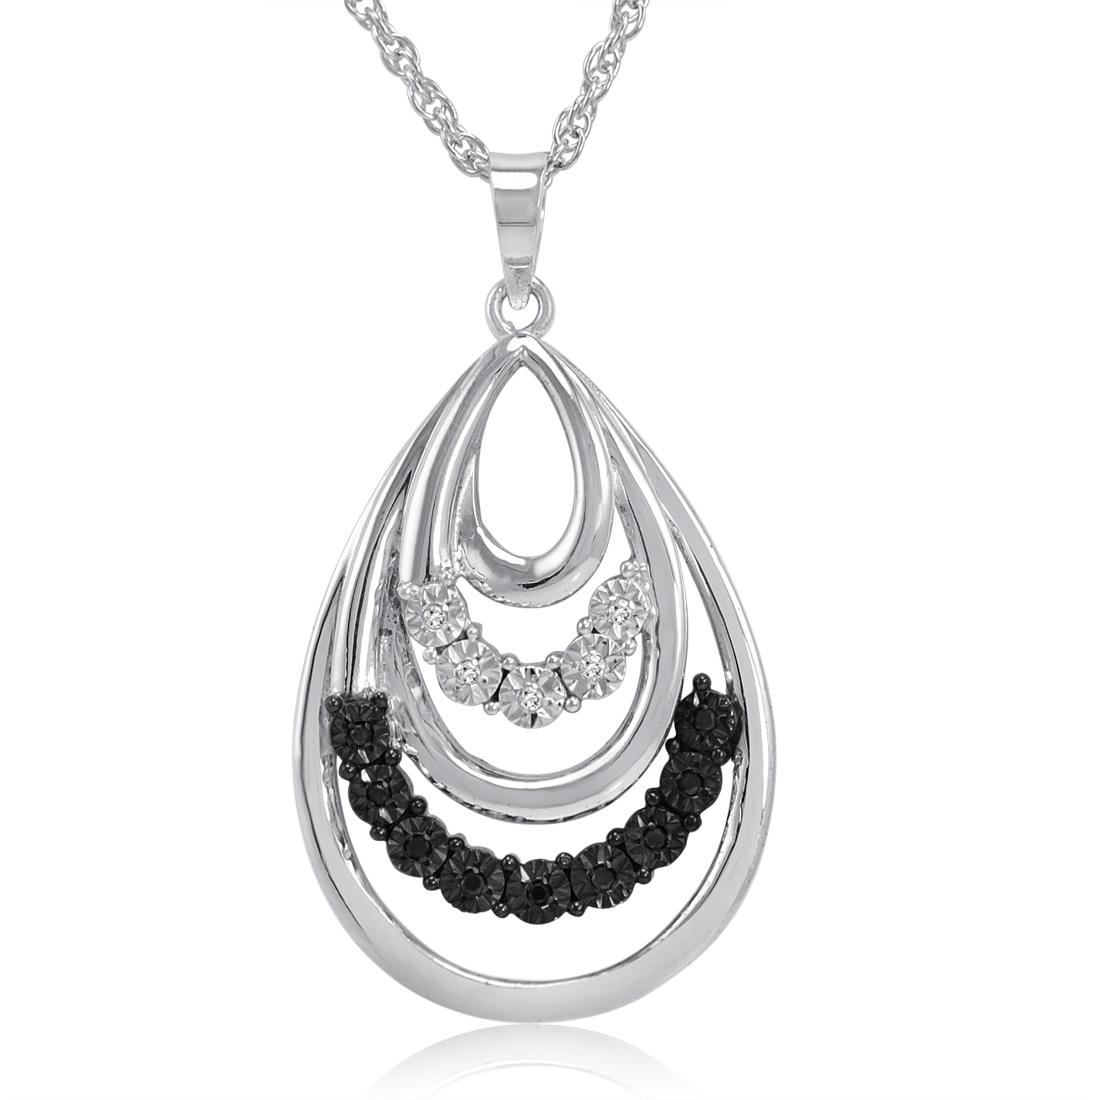 black and white tear drop pendant necklace in sterling. Black Bedroom Furniture Sets. Home Design Ideas